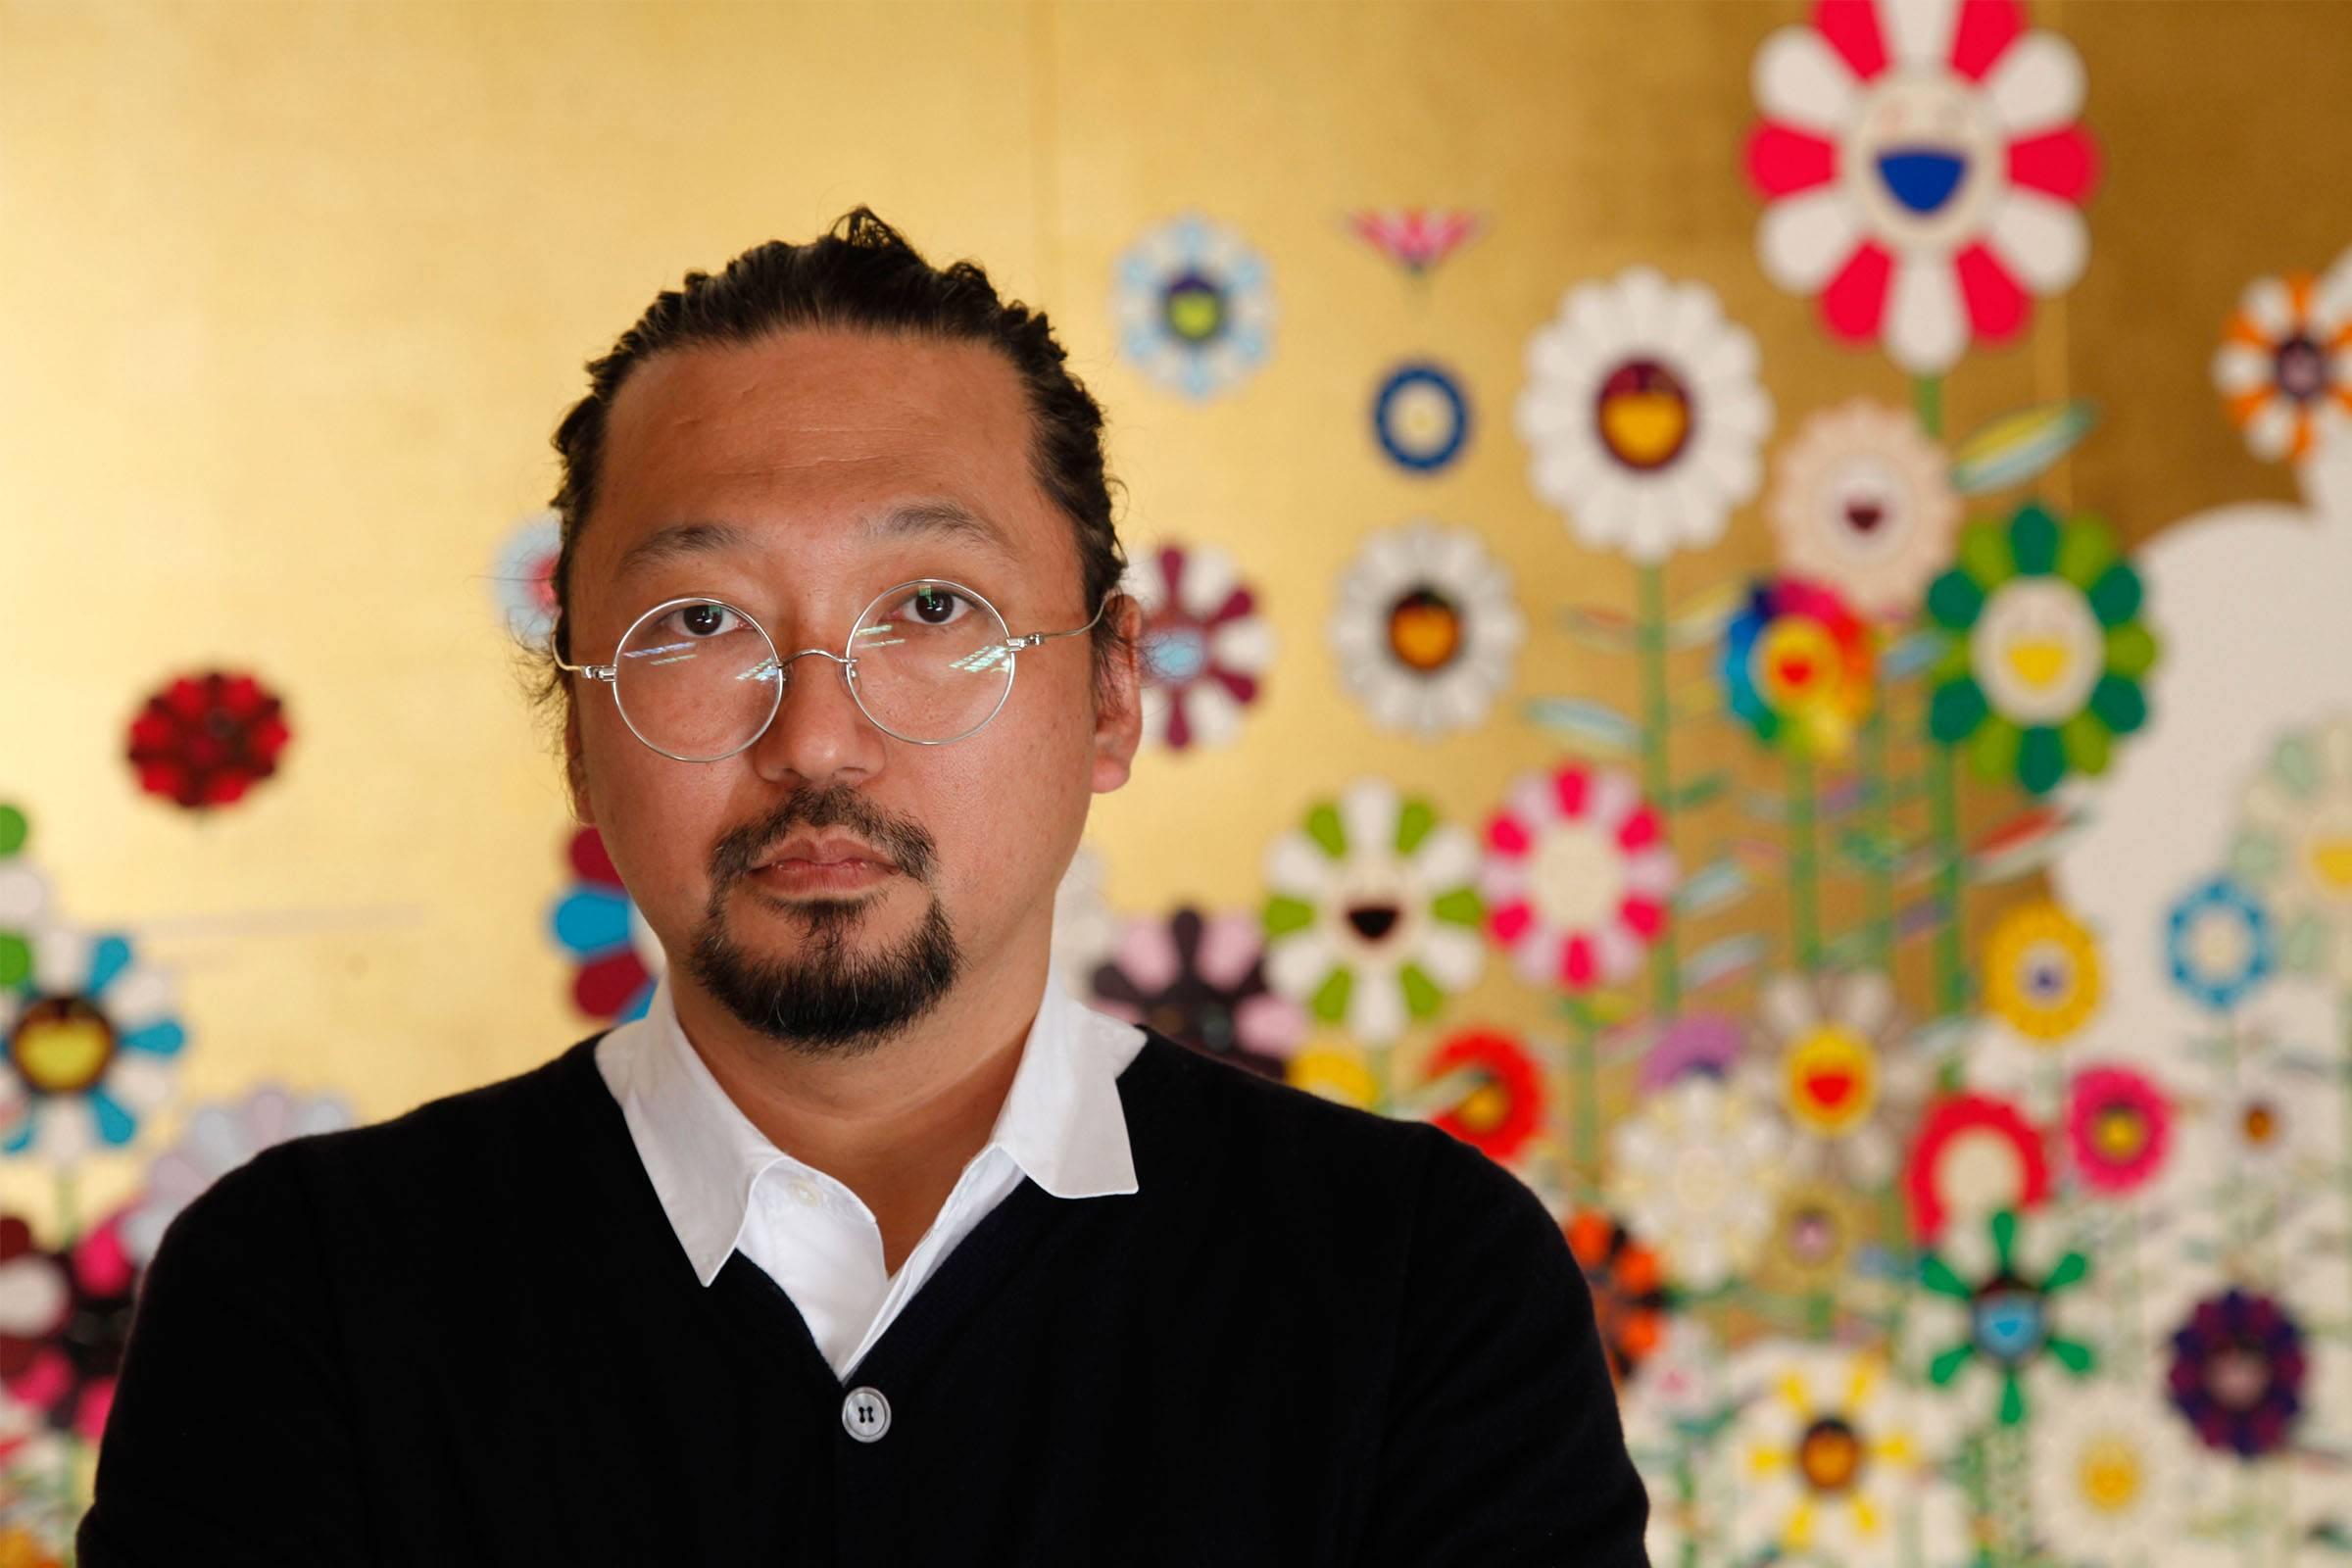 Takashi Murakami's Artistic Commercialism